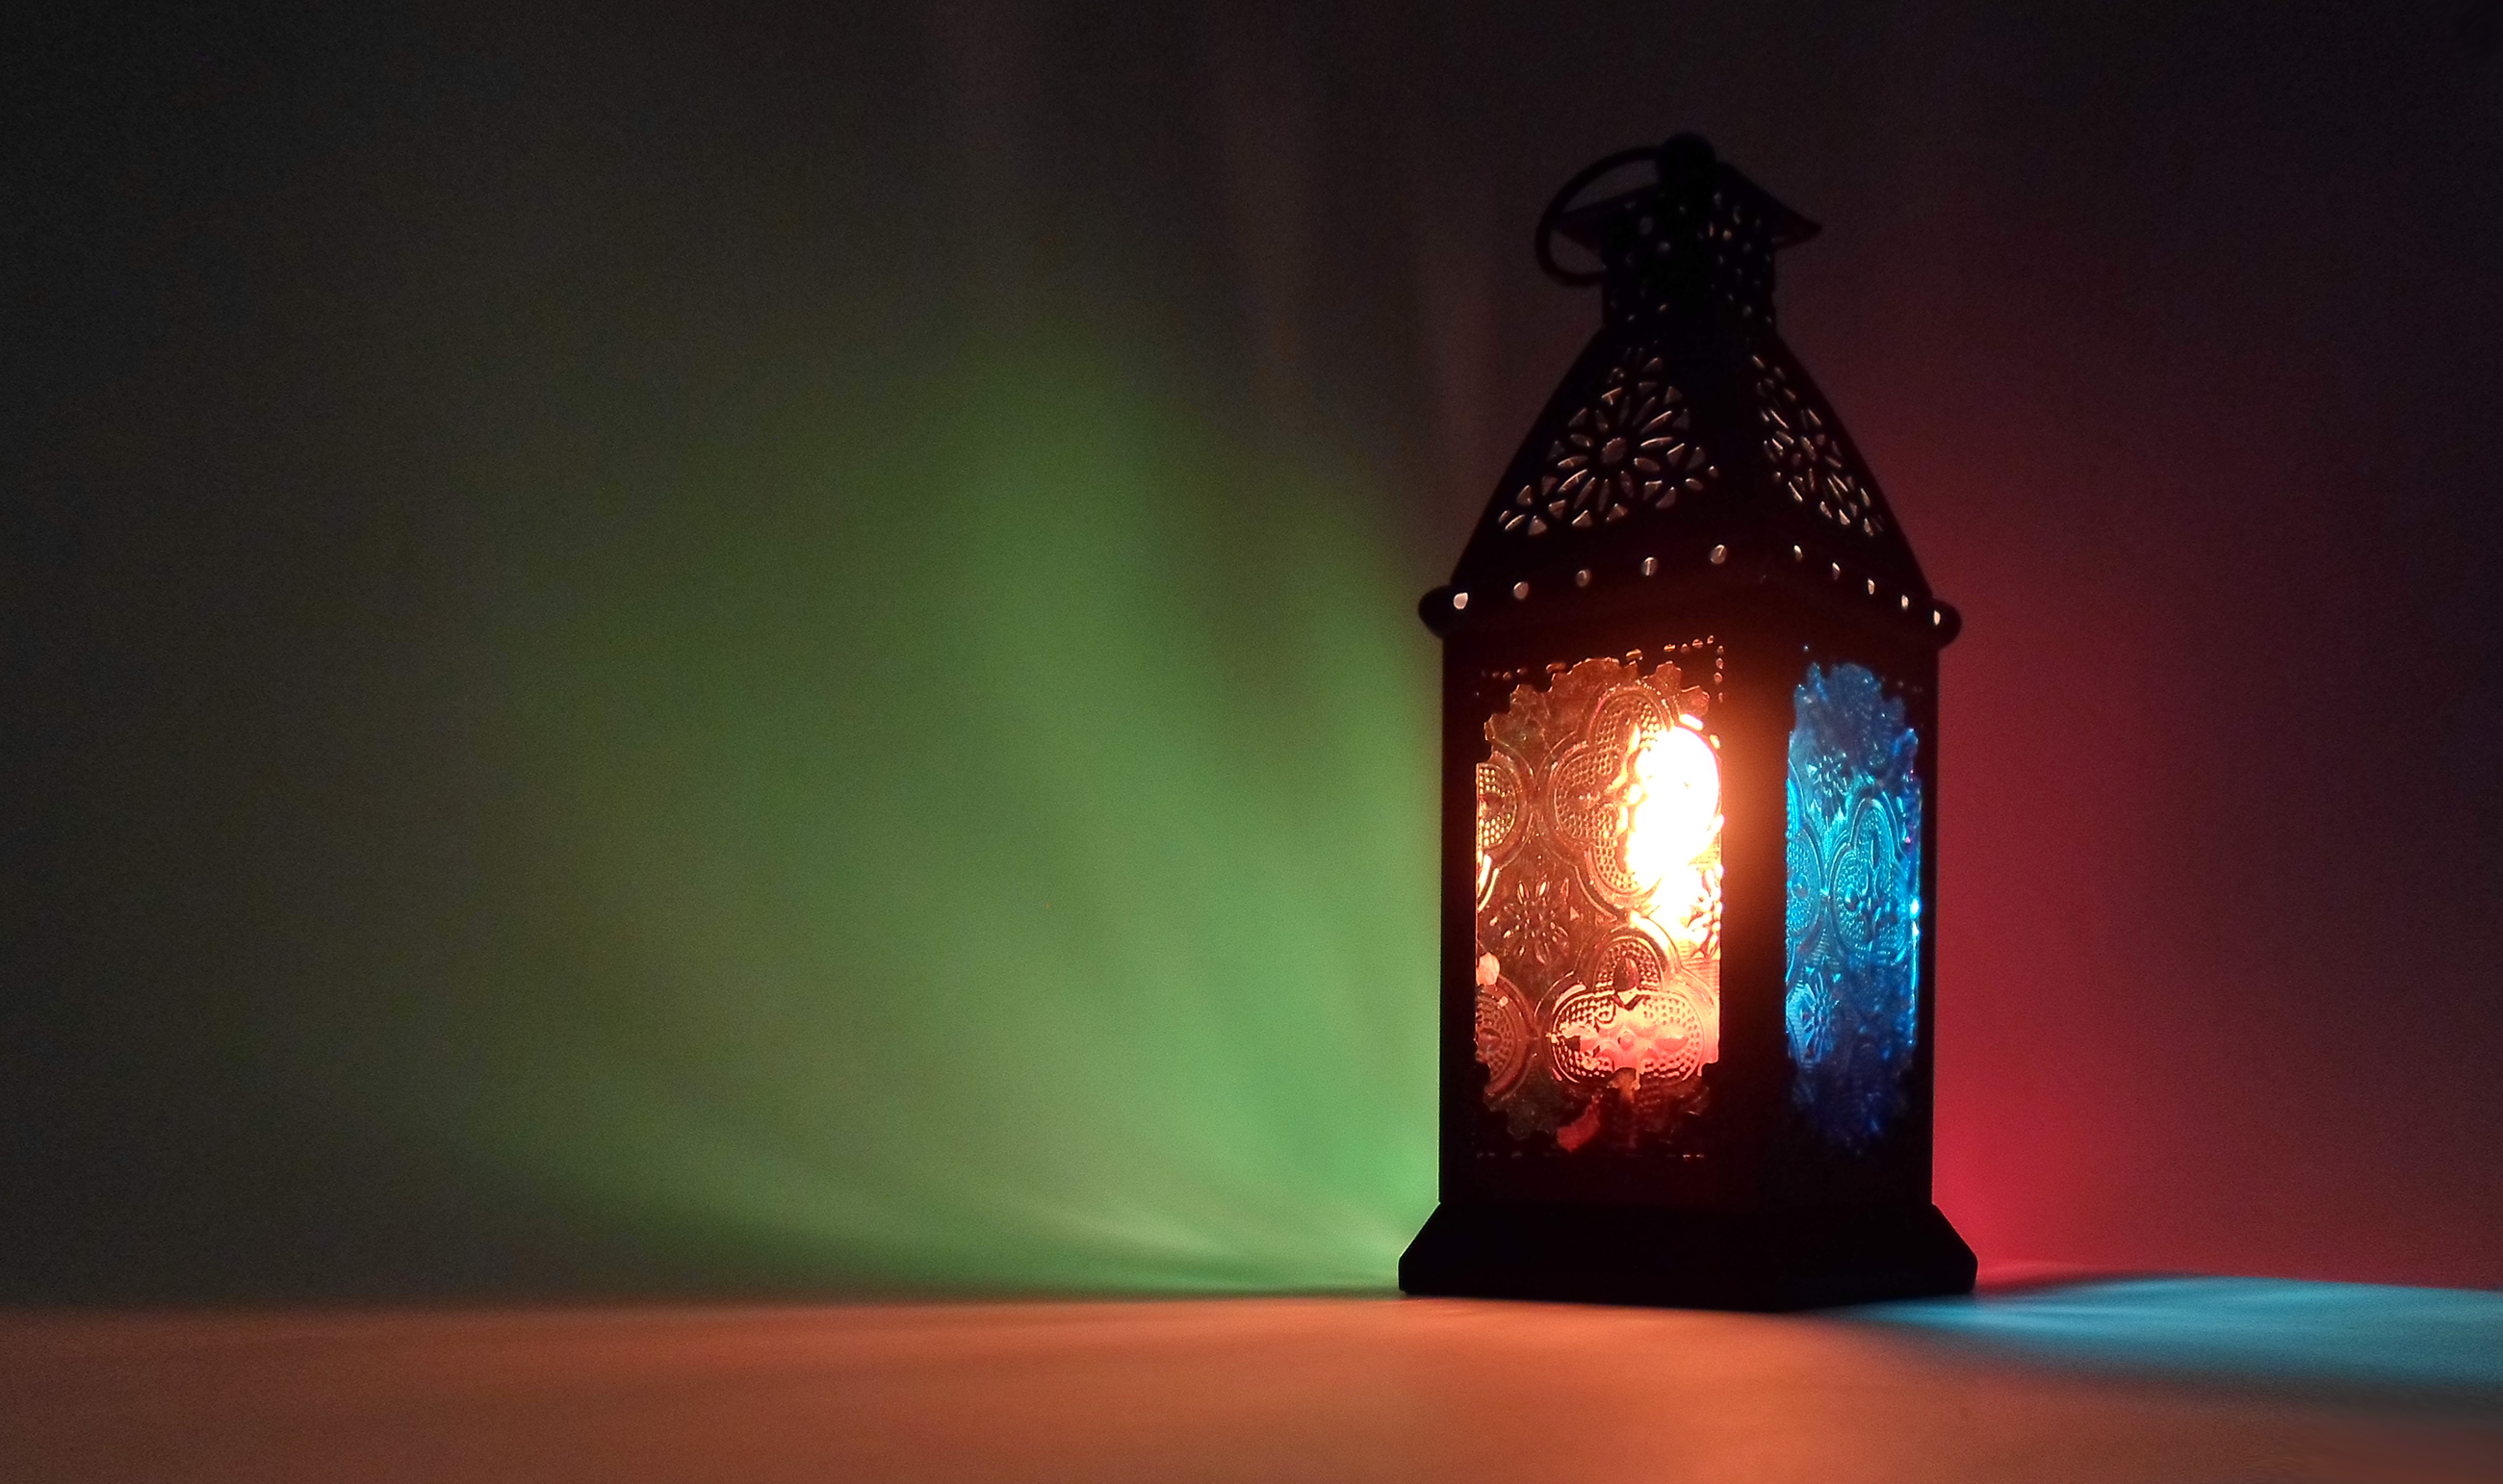 صورة اجمل صور عن رمضان , معلومات عن رمضان